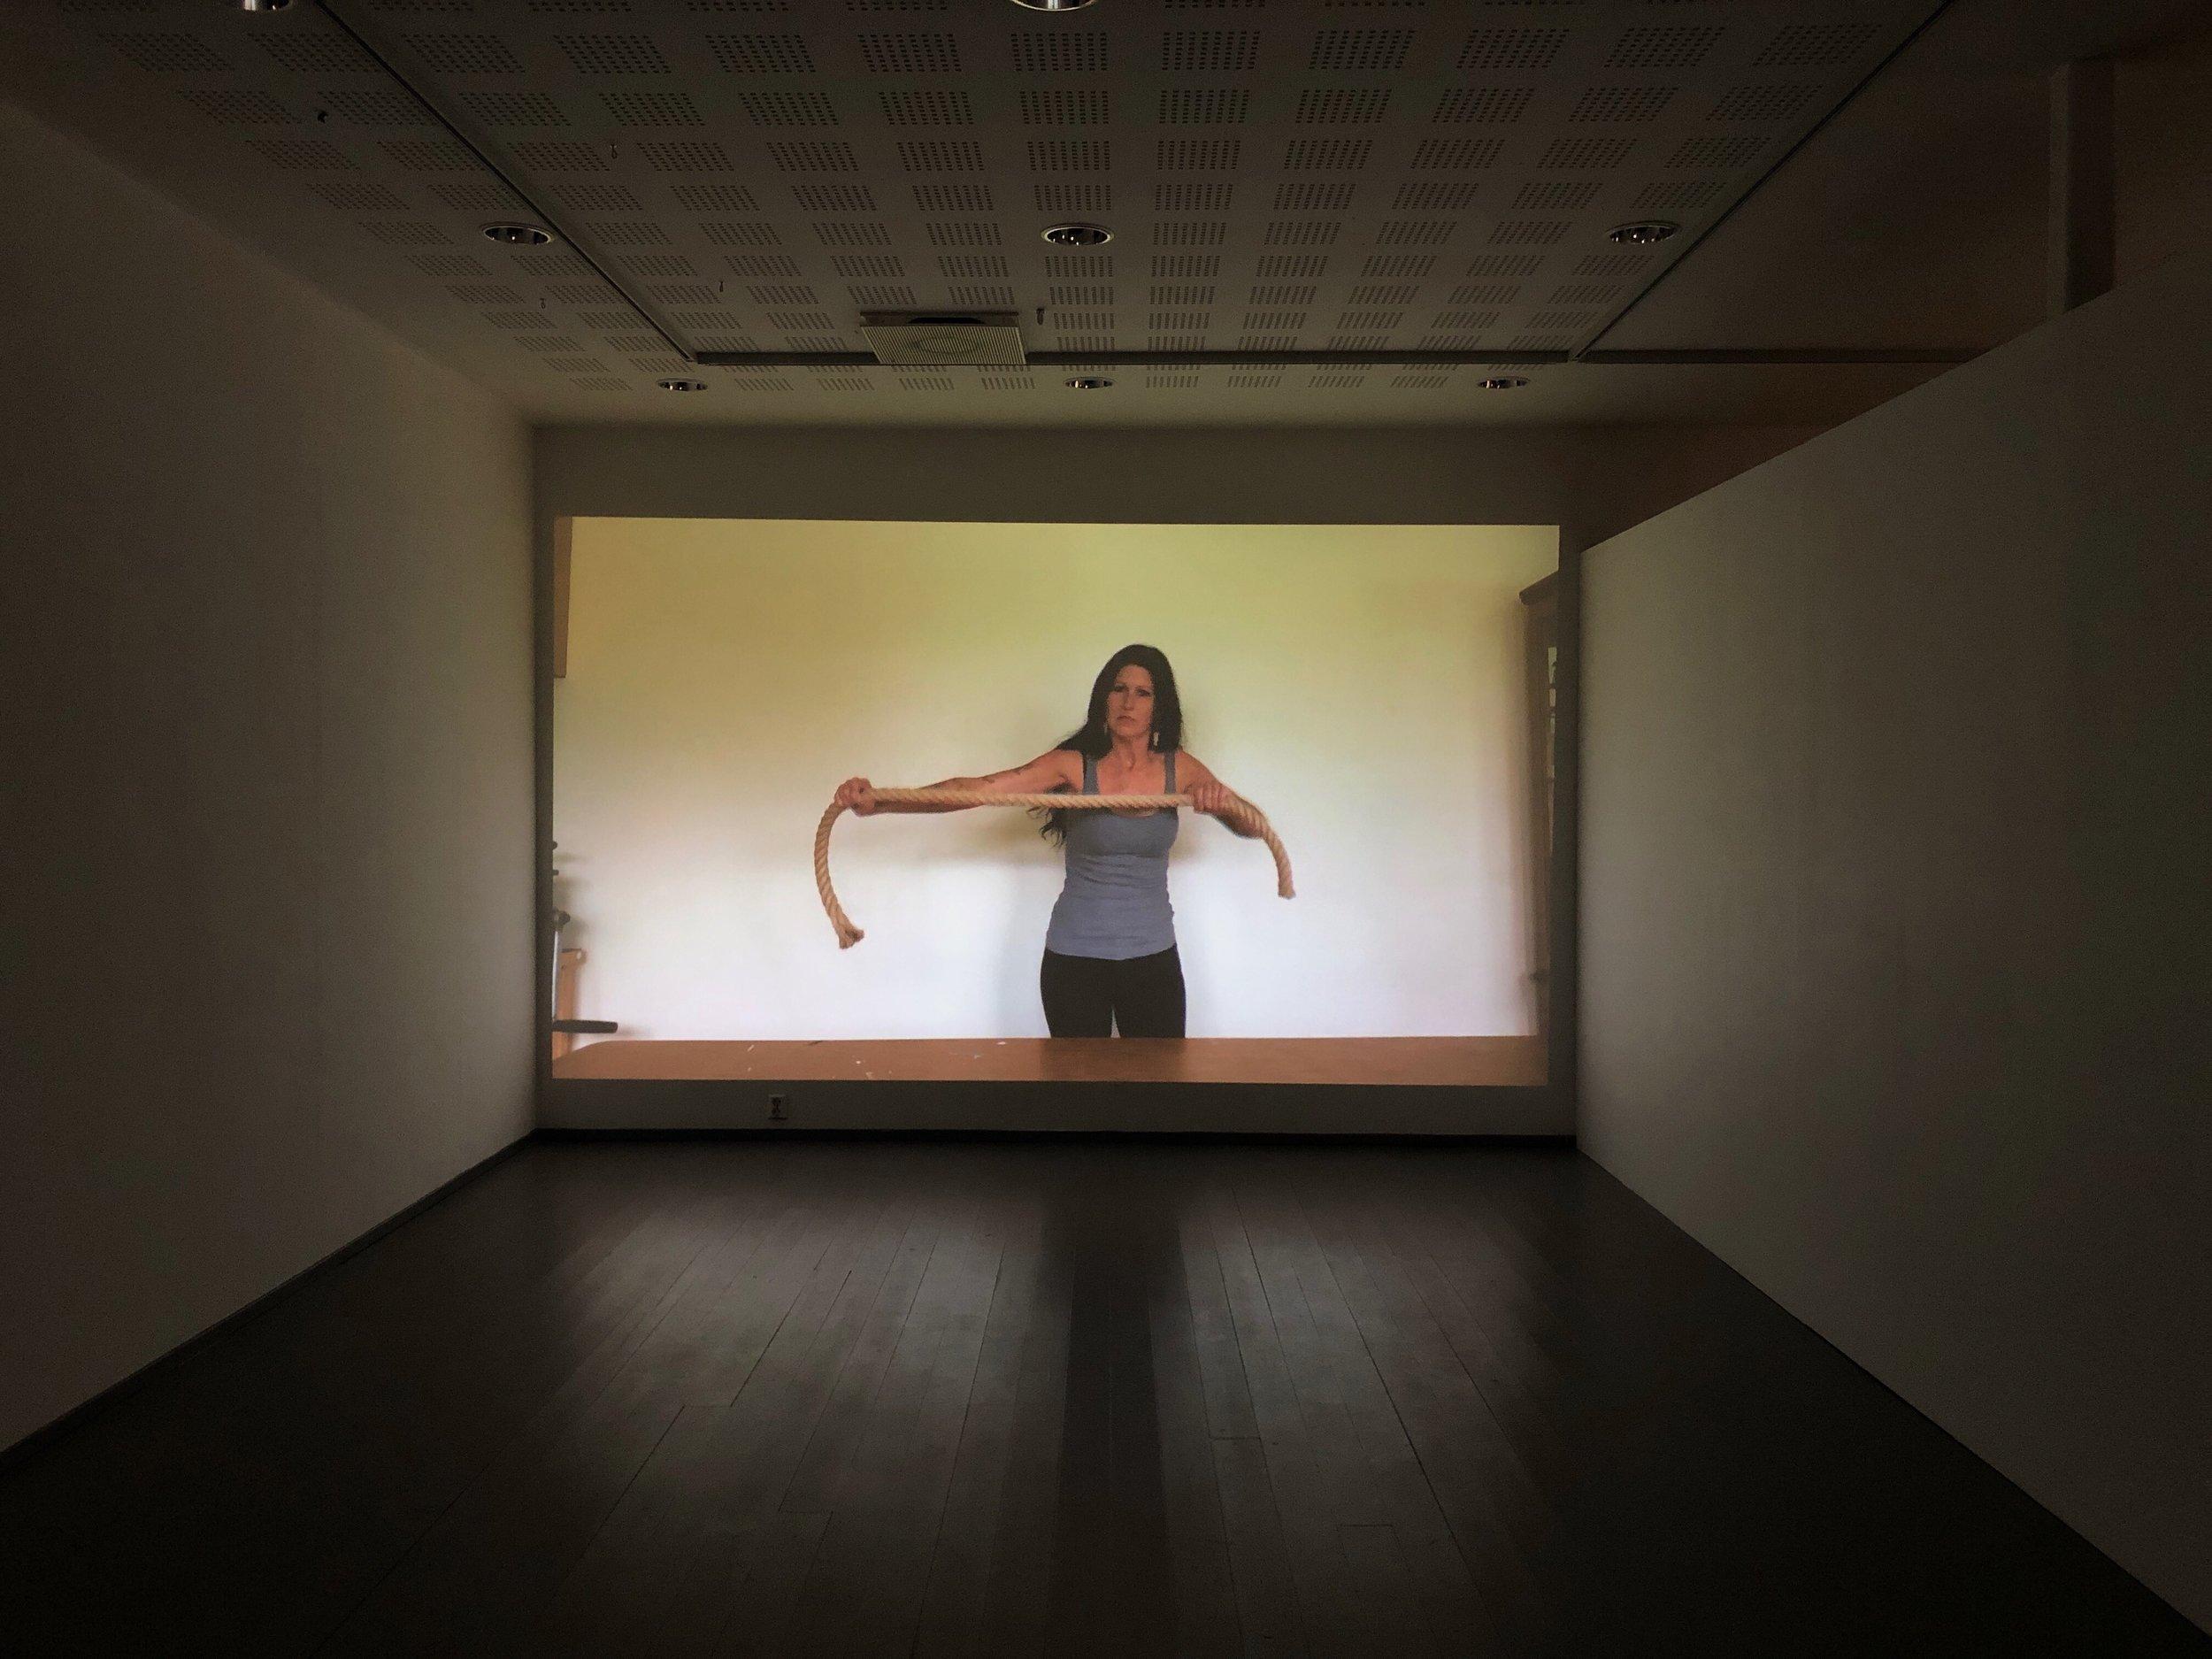 Merritt Johnson's video  Exorcise Global Health: Knowing the Ropes  (2019) premiered in the festival exhibtion. Photo: Hilde Sørstrøm